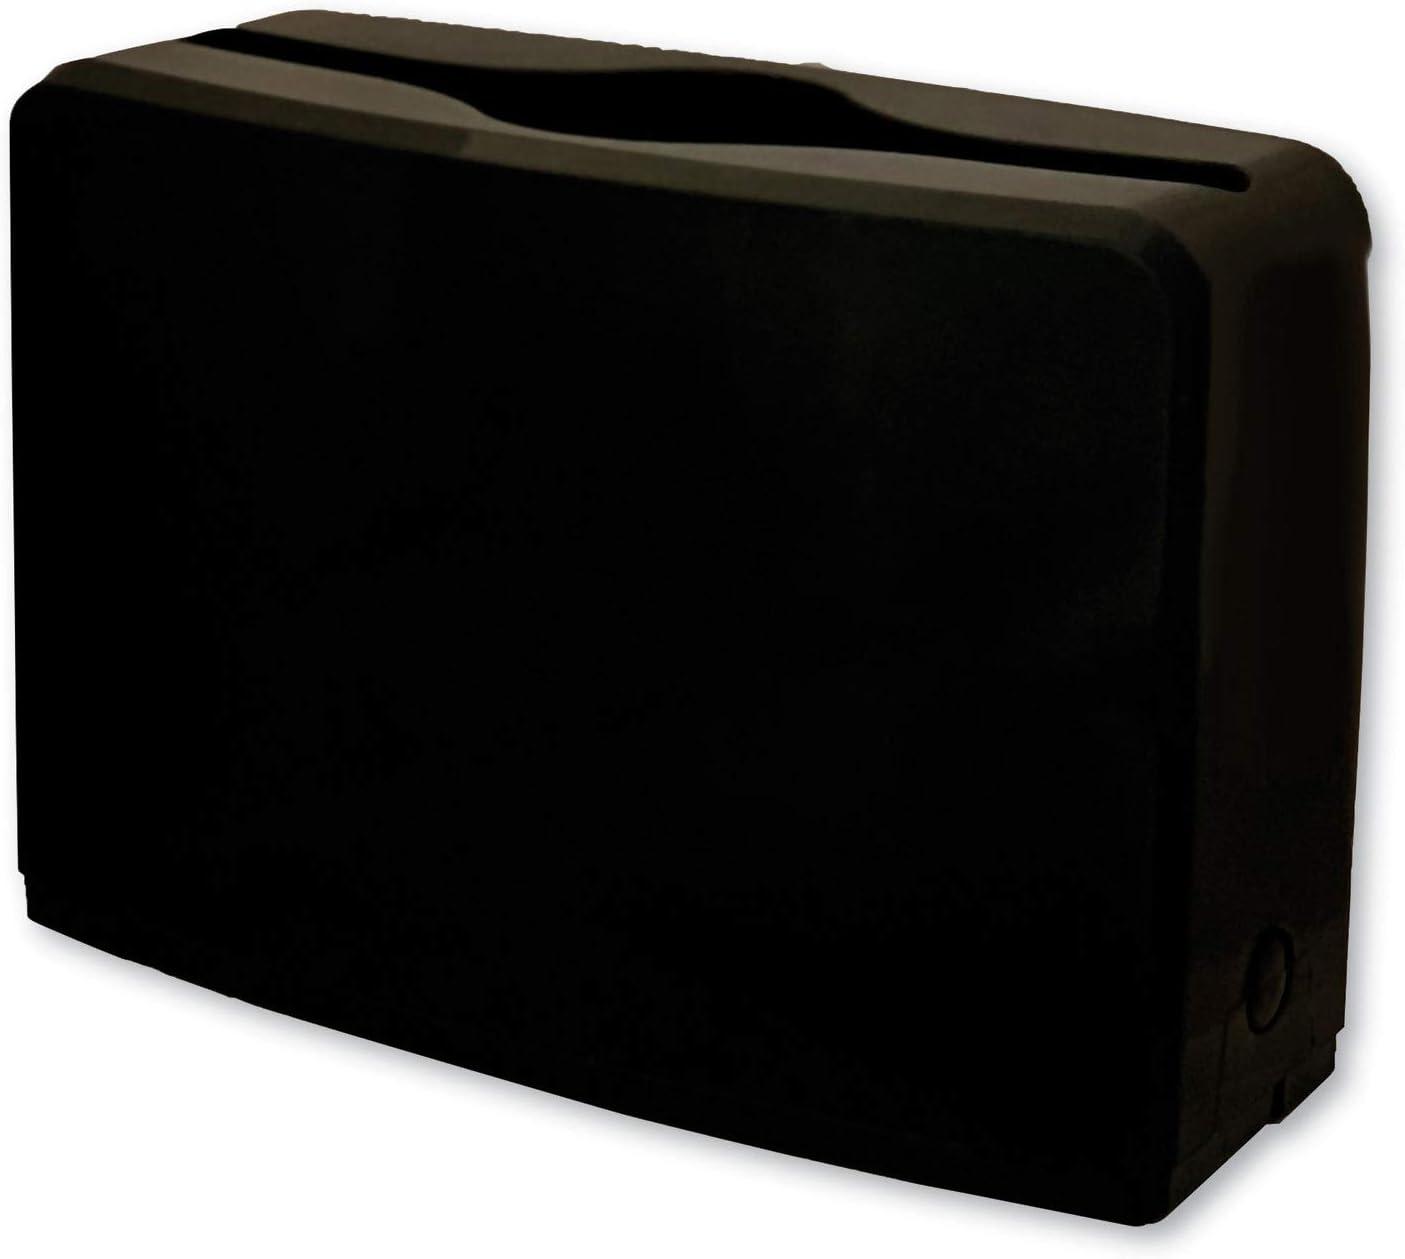 GEN1607 - GEN-PAK Corp. Countertop Folded Towel Dispenser